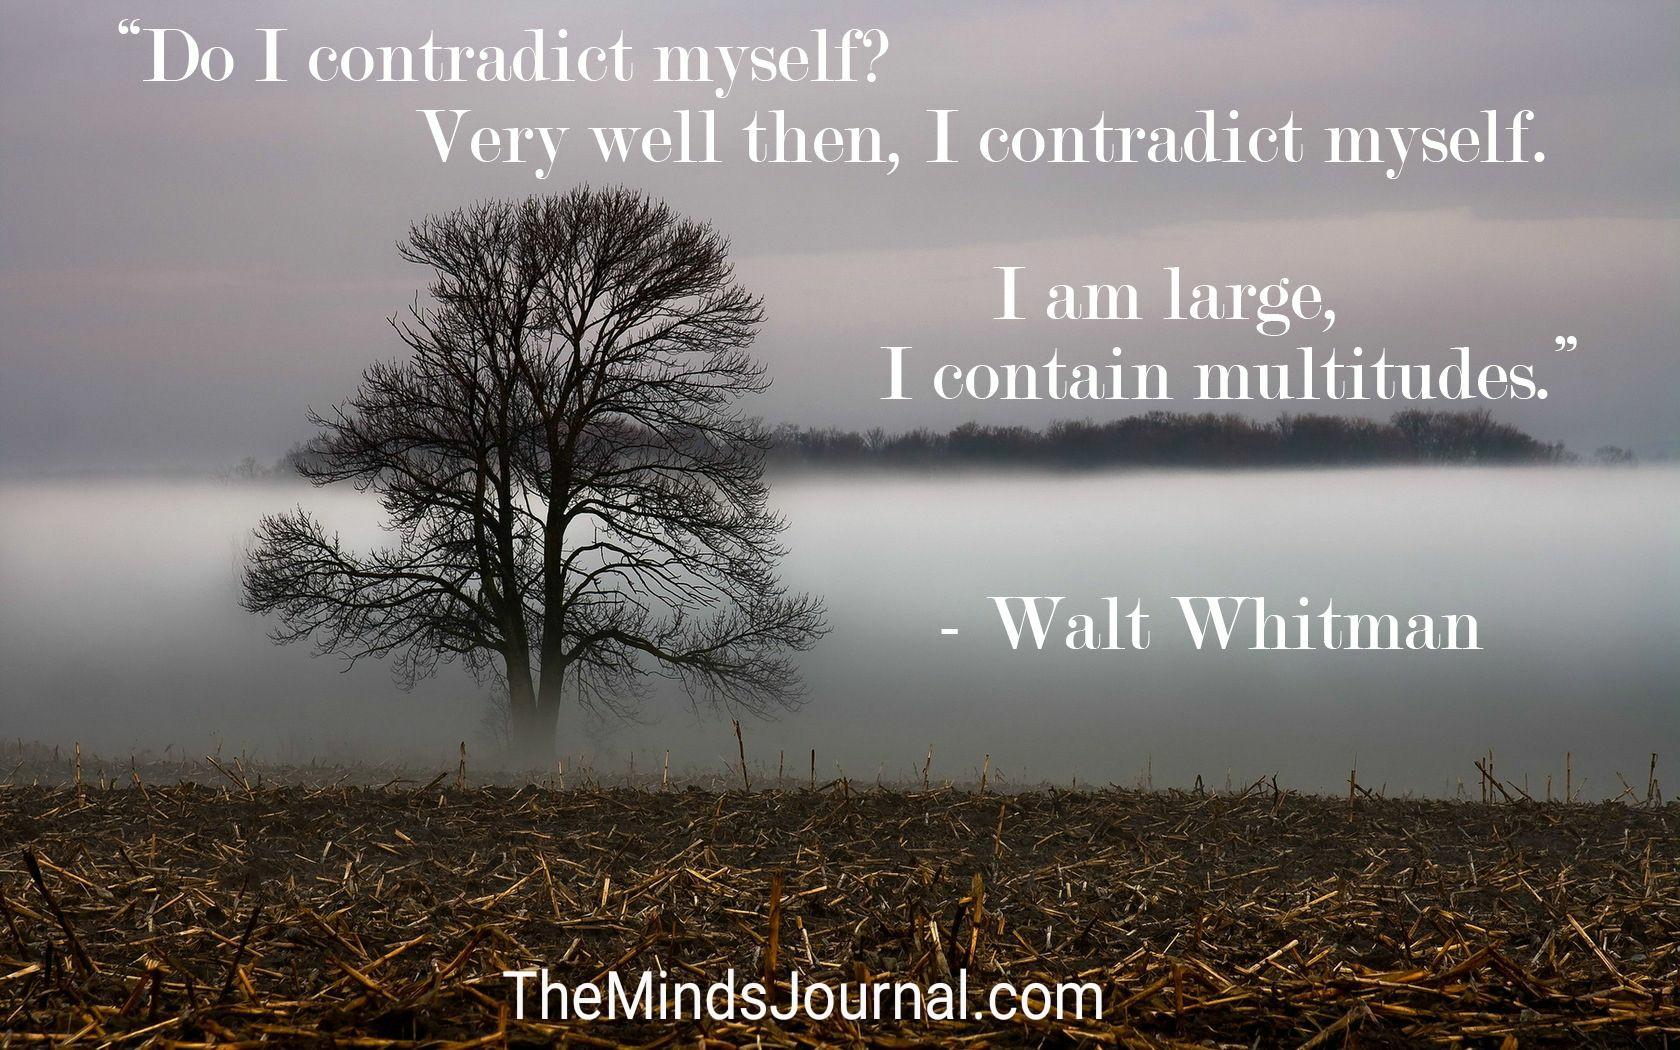 I contradict myself